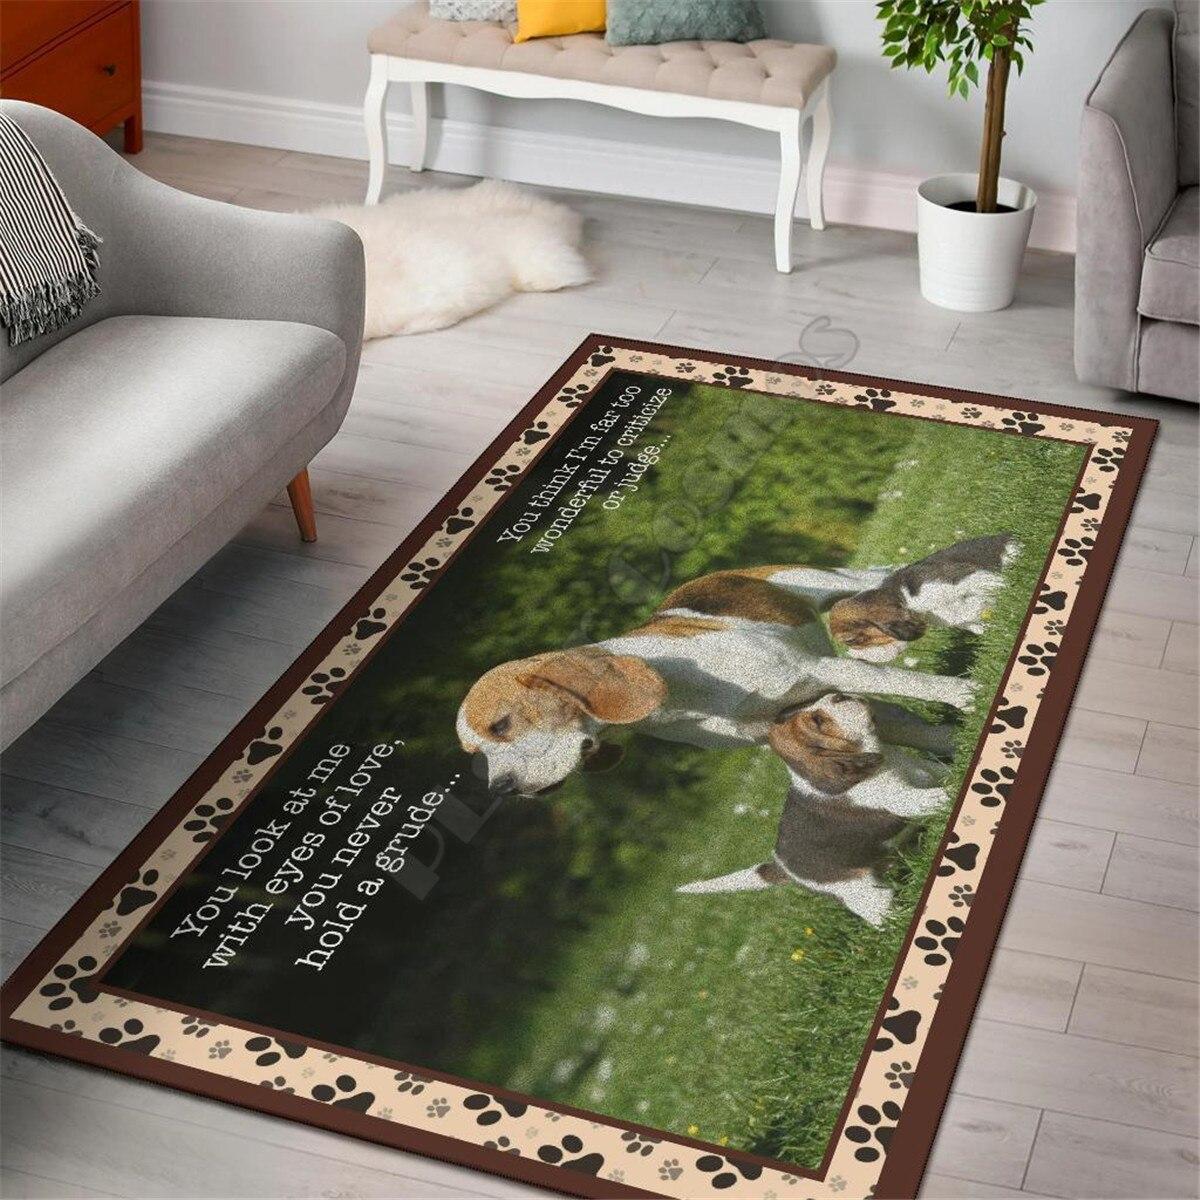 Beagle منطقة البساط مضحك الكلب جمع سجادة أرضية سجادة سجادة ضد الإنزلاق غرفة الطعام غرفة المعيشة لينة سجادة غرفة النوم